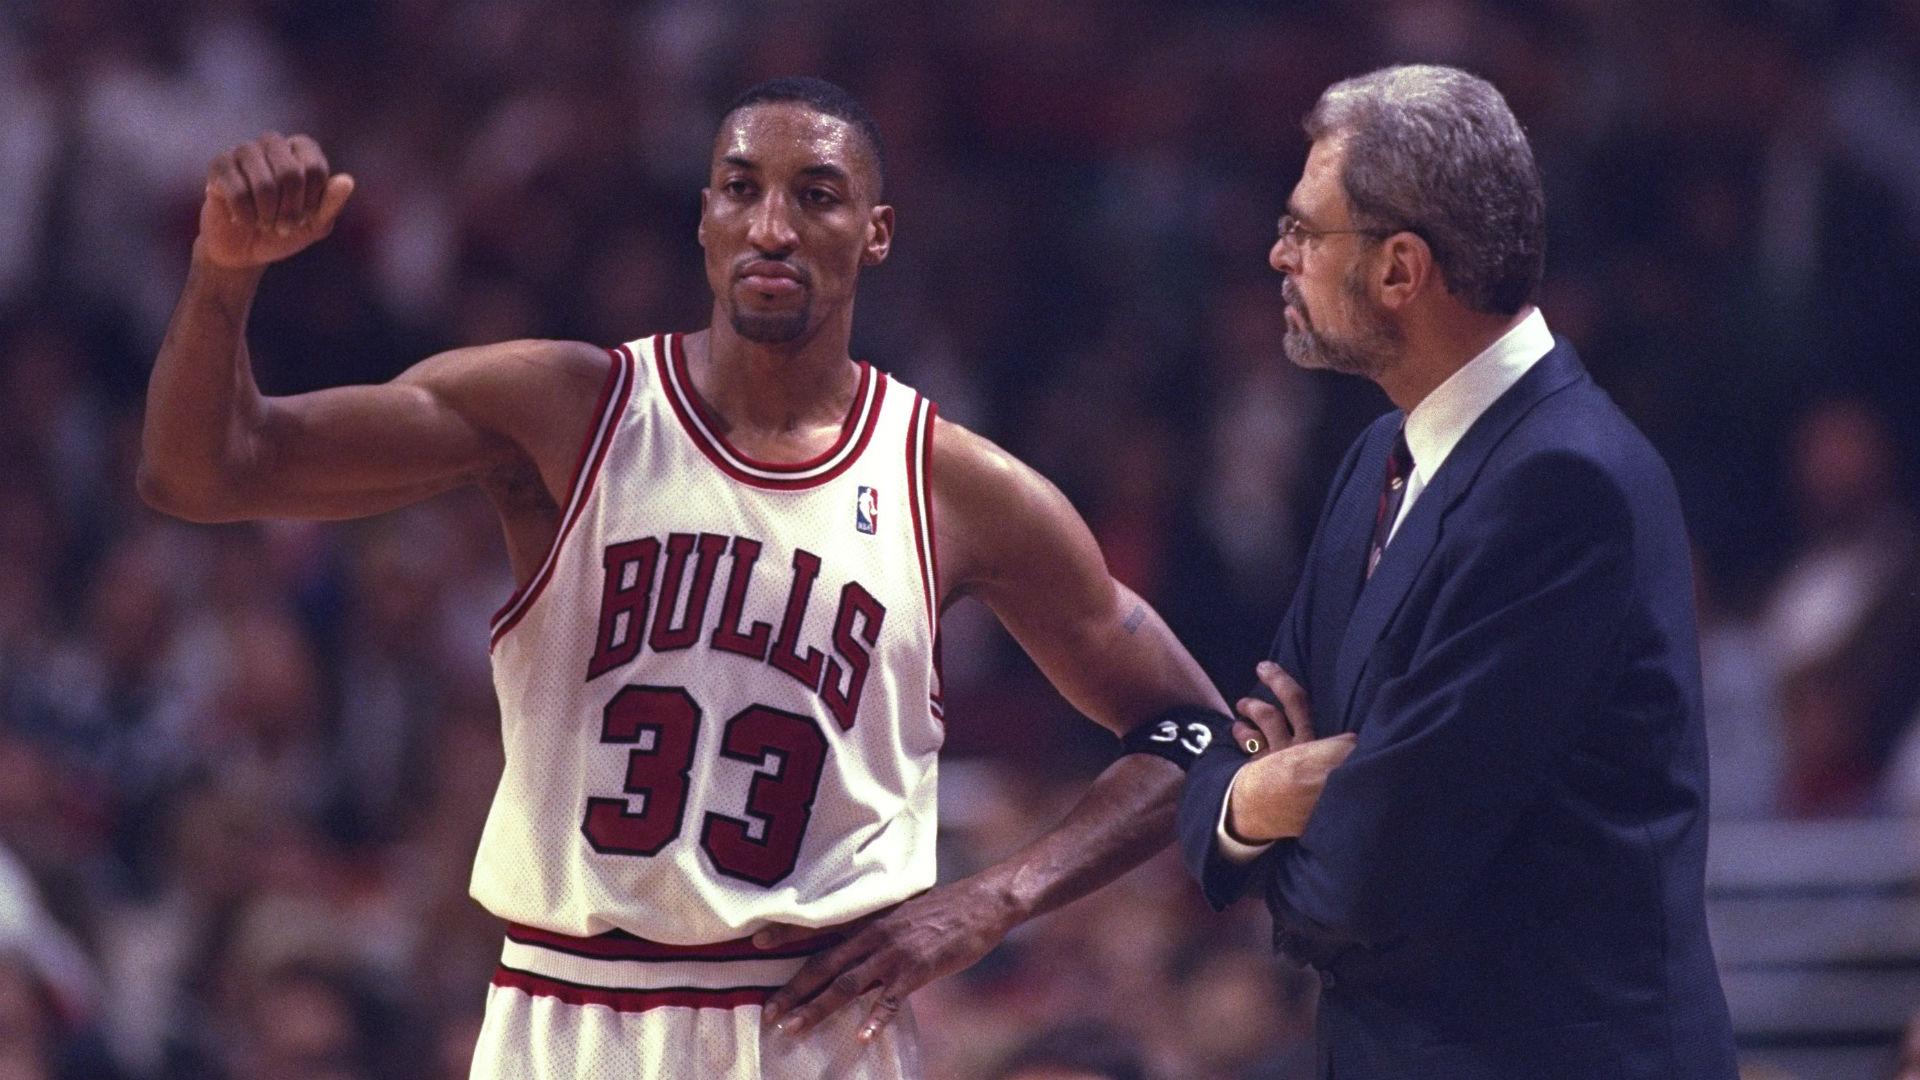 Scottie Pippen sits down: How Bulls star's blunder overshadowed Toni Kukoc's buzzer-beater vs. Knicks